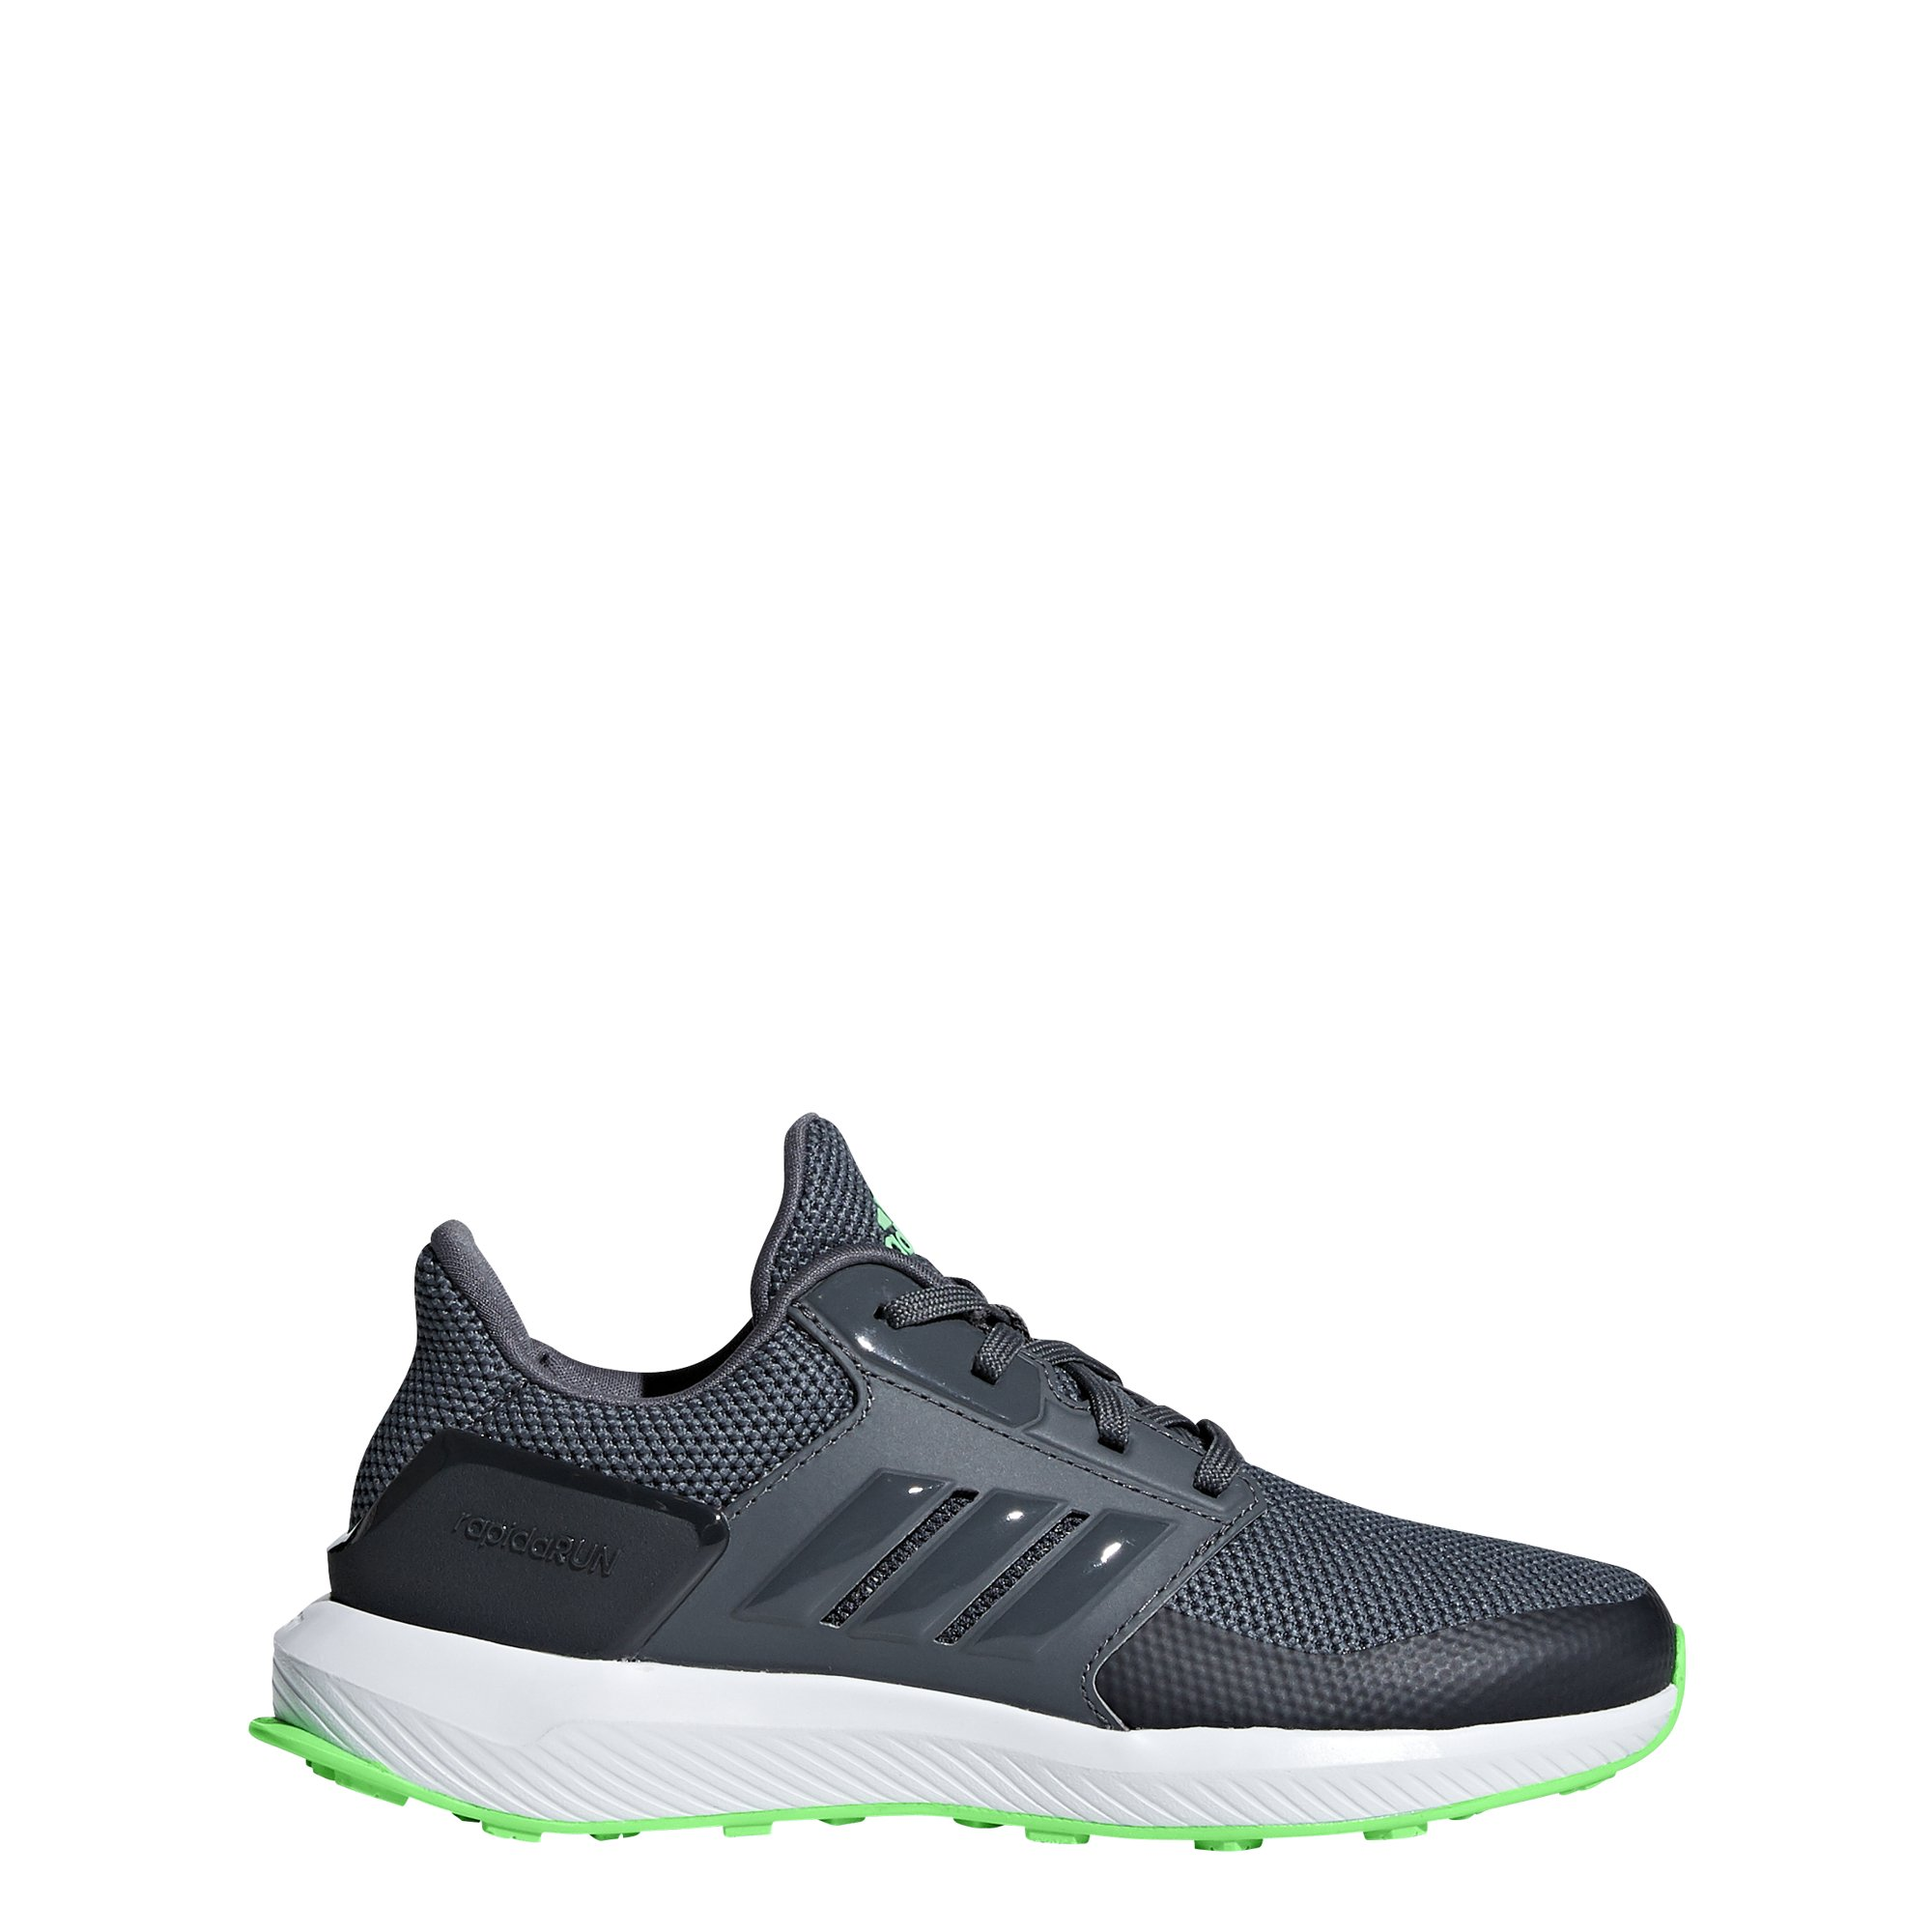 adidas Originals Unisex-Kids Rapidarun Running Shoe, Grey/Shock Lime/Carbon, 7 M US Big Kid